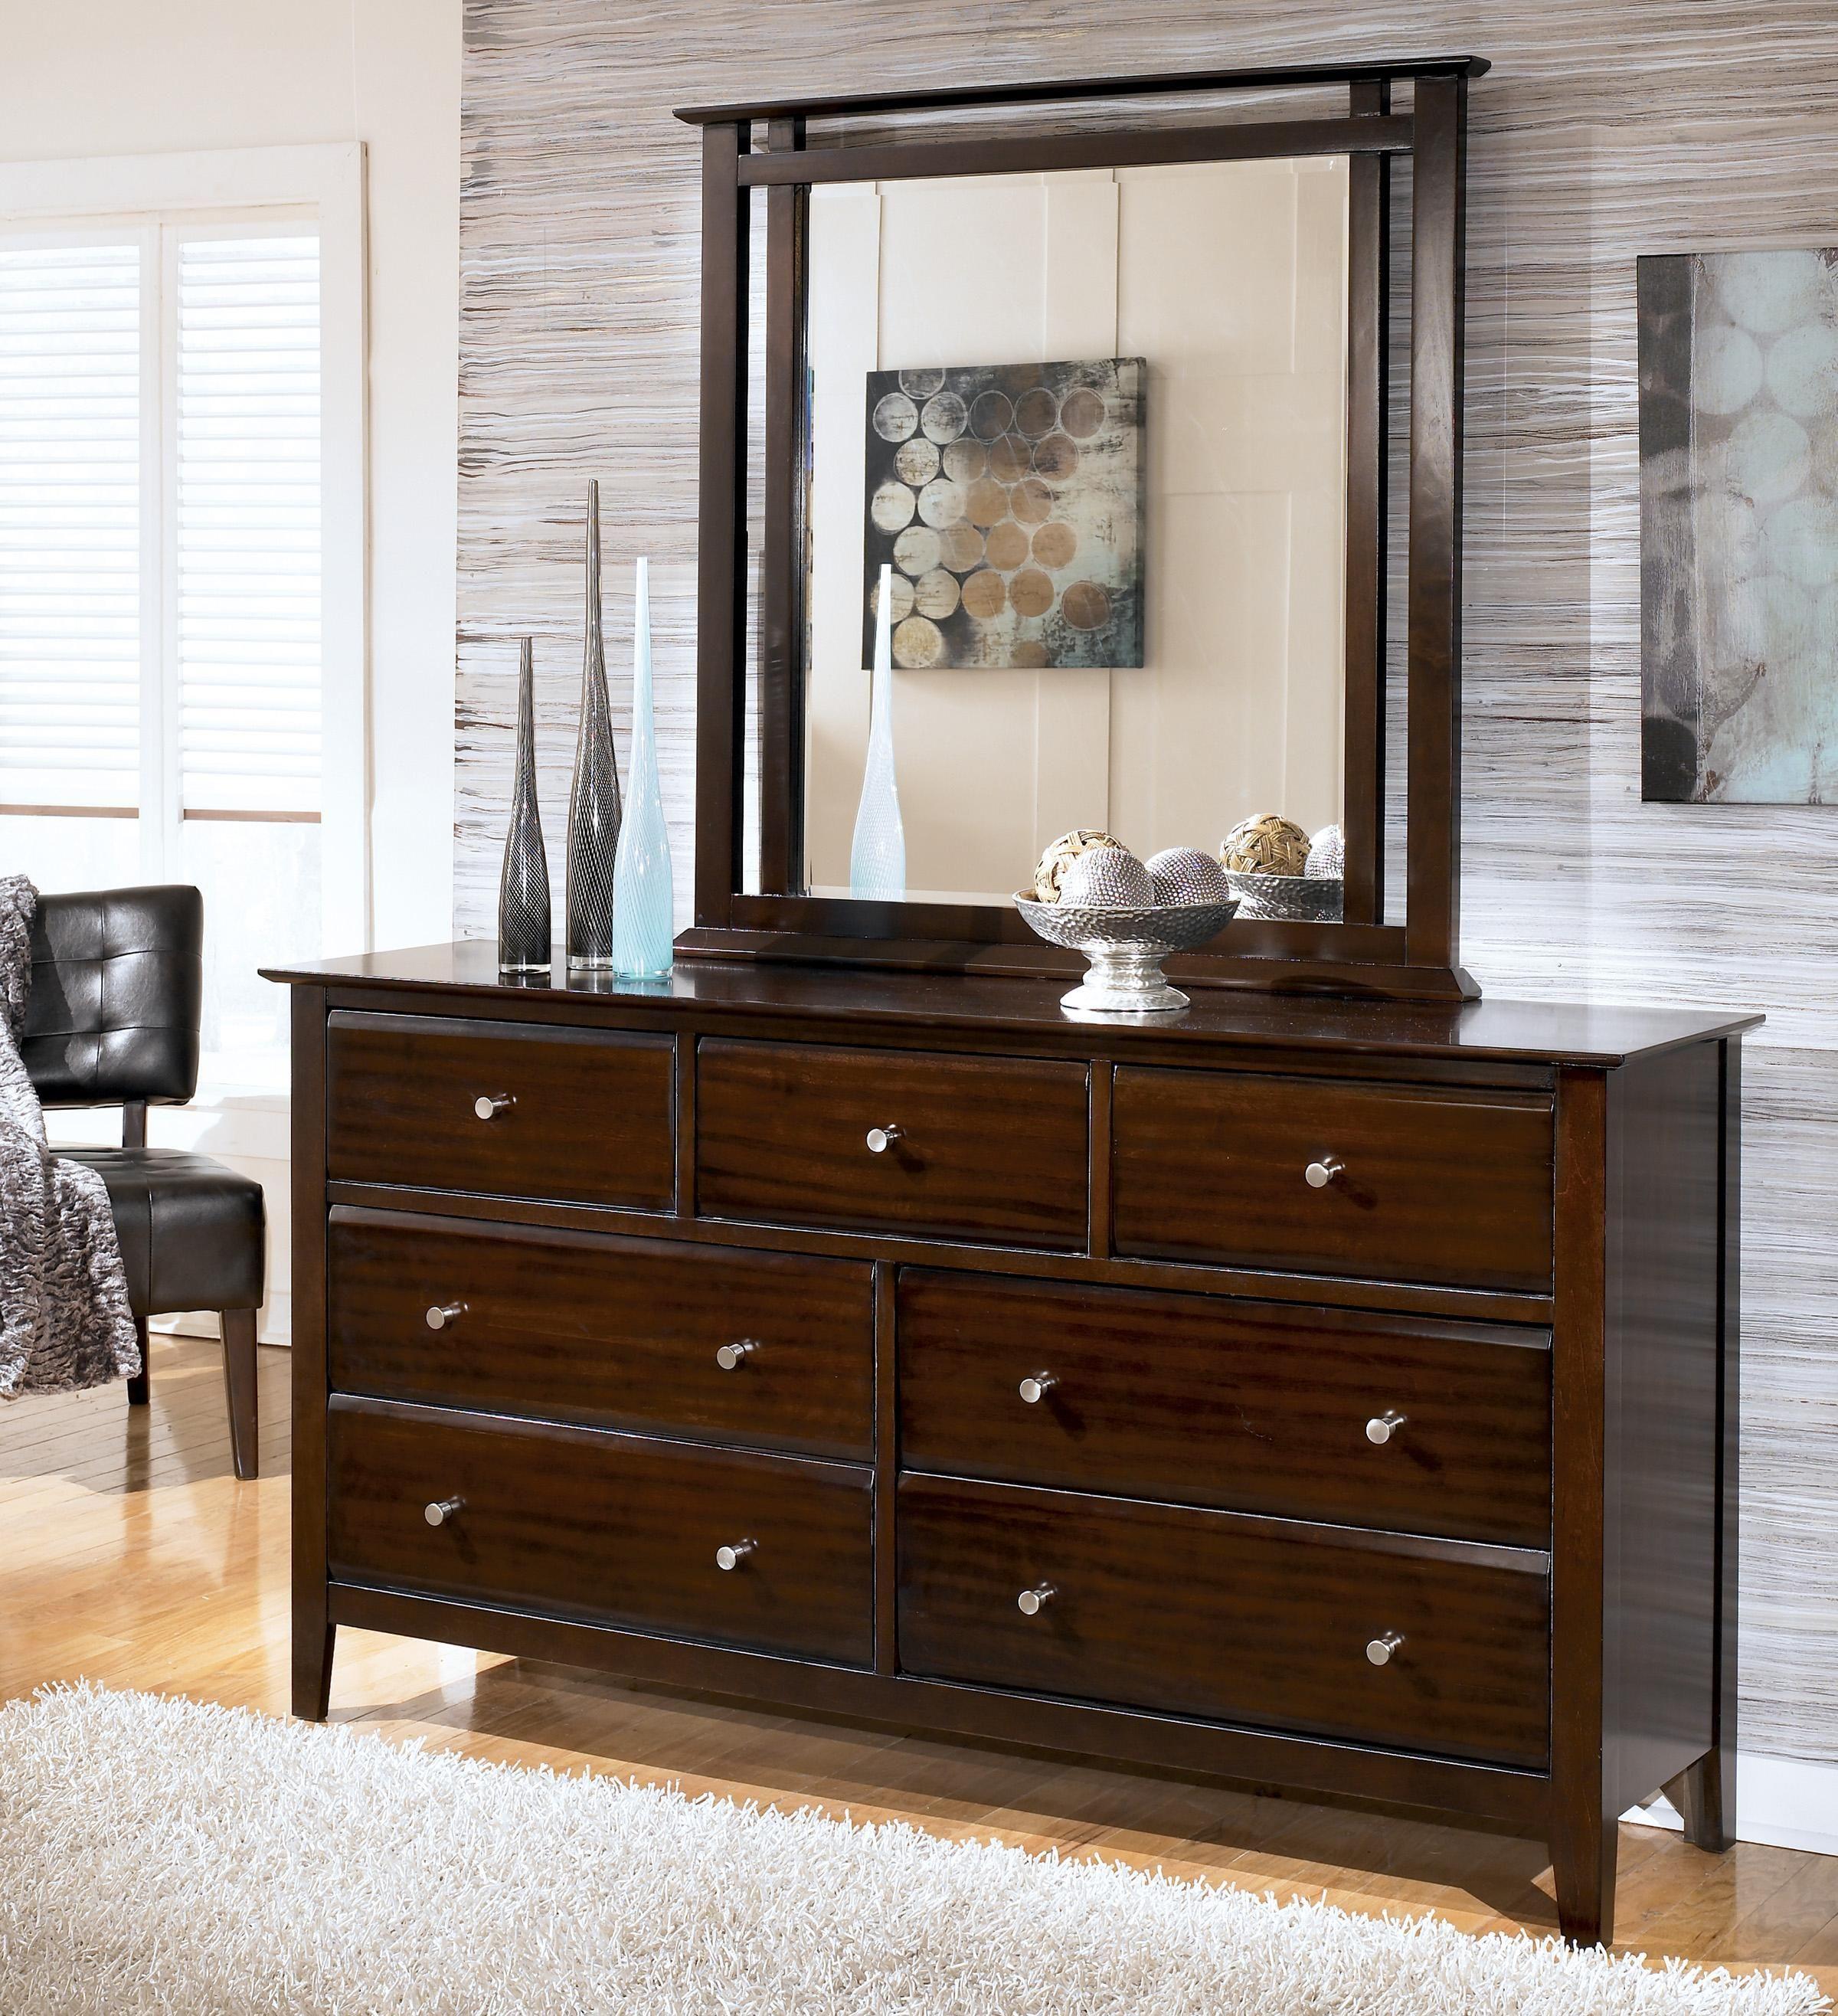 Great Furniture · Furniture Stores In Farmington Nm ...